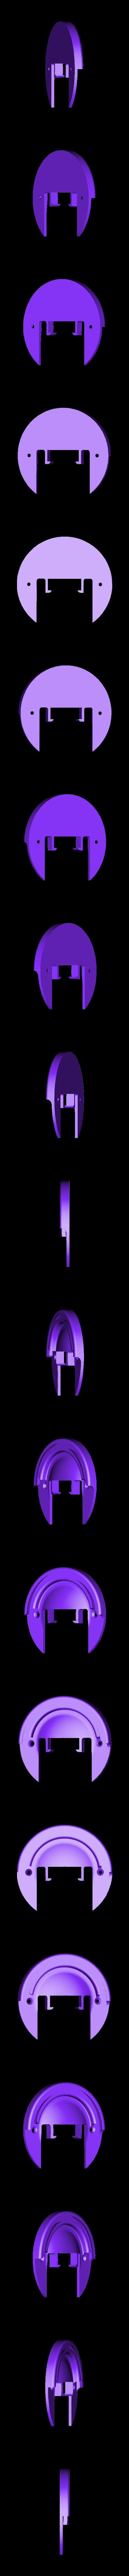 LM_mur.stl Download STL file Luminaires • Design to 3D print, Barbe_Iturique